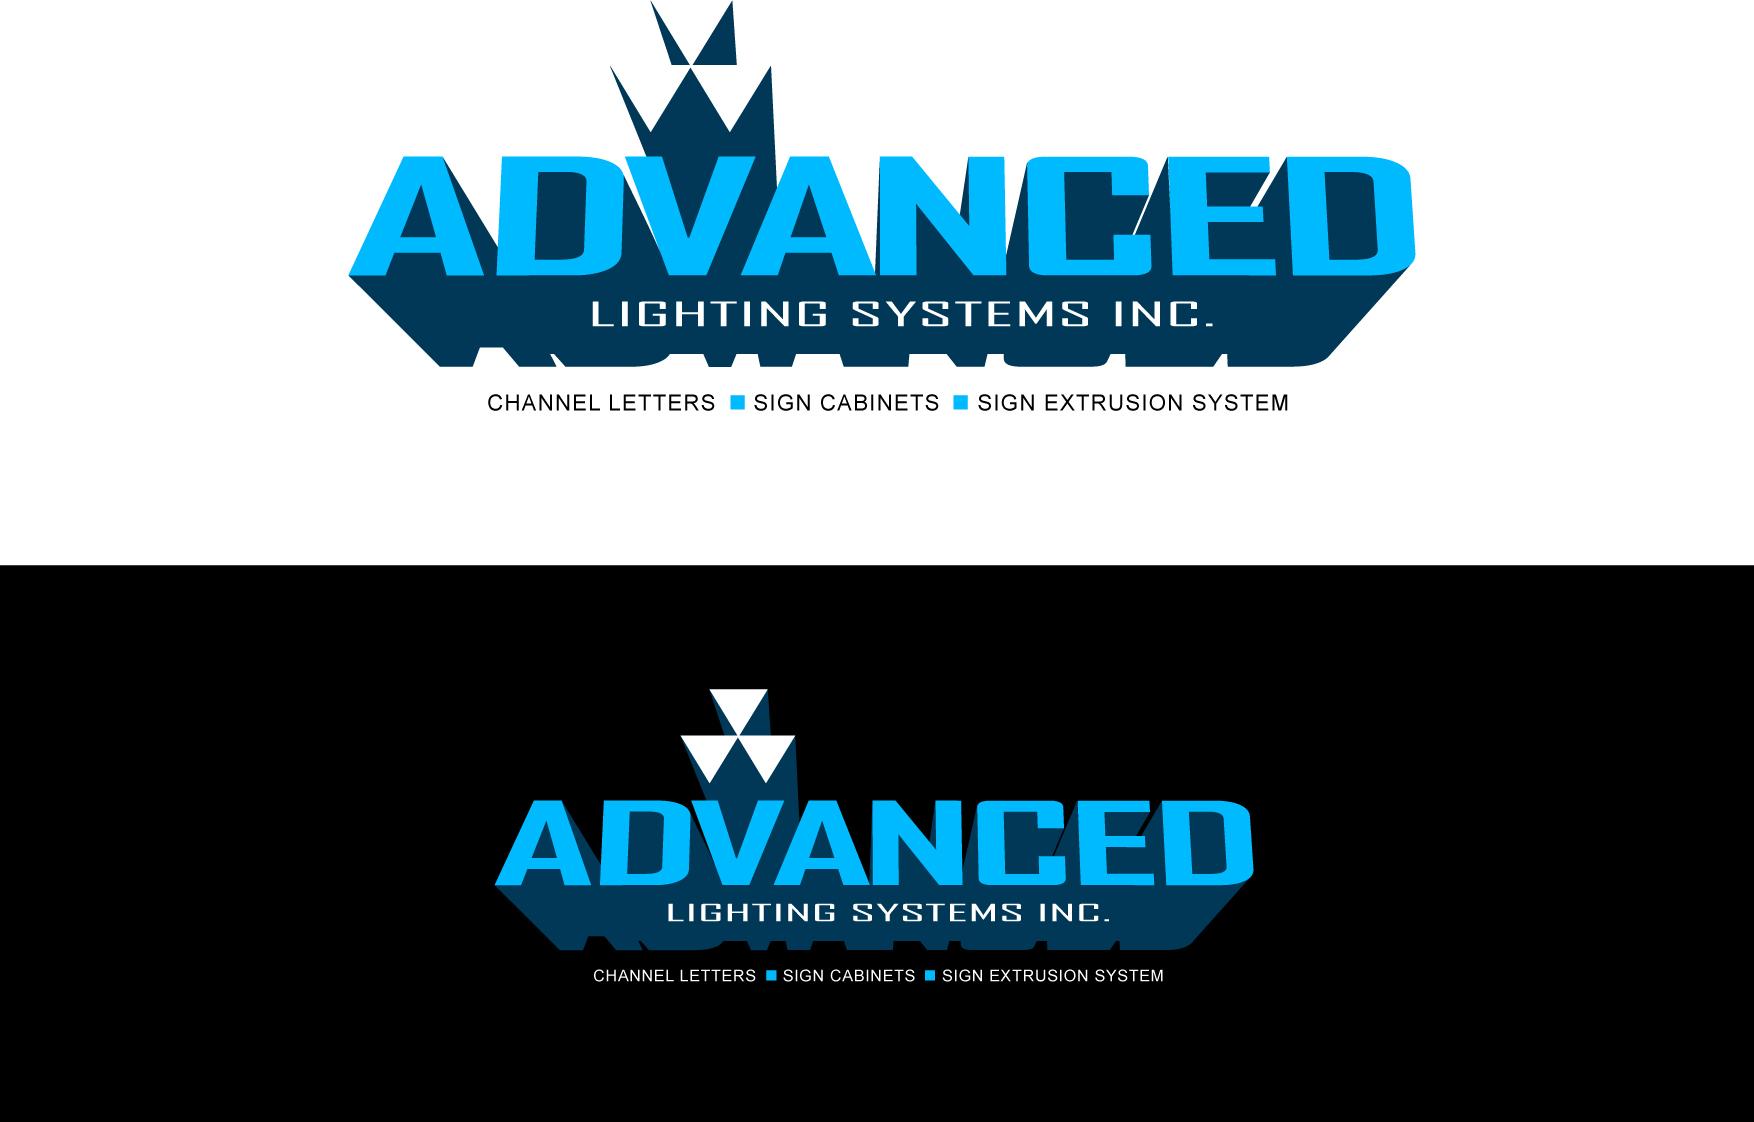 Logo Design by Wilfredo Mendoza - Entry No. 172 in the Logo Design Contest New Logo Design Needed for  Company Advanced Lighting Systems Inc..